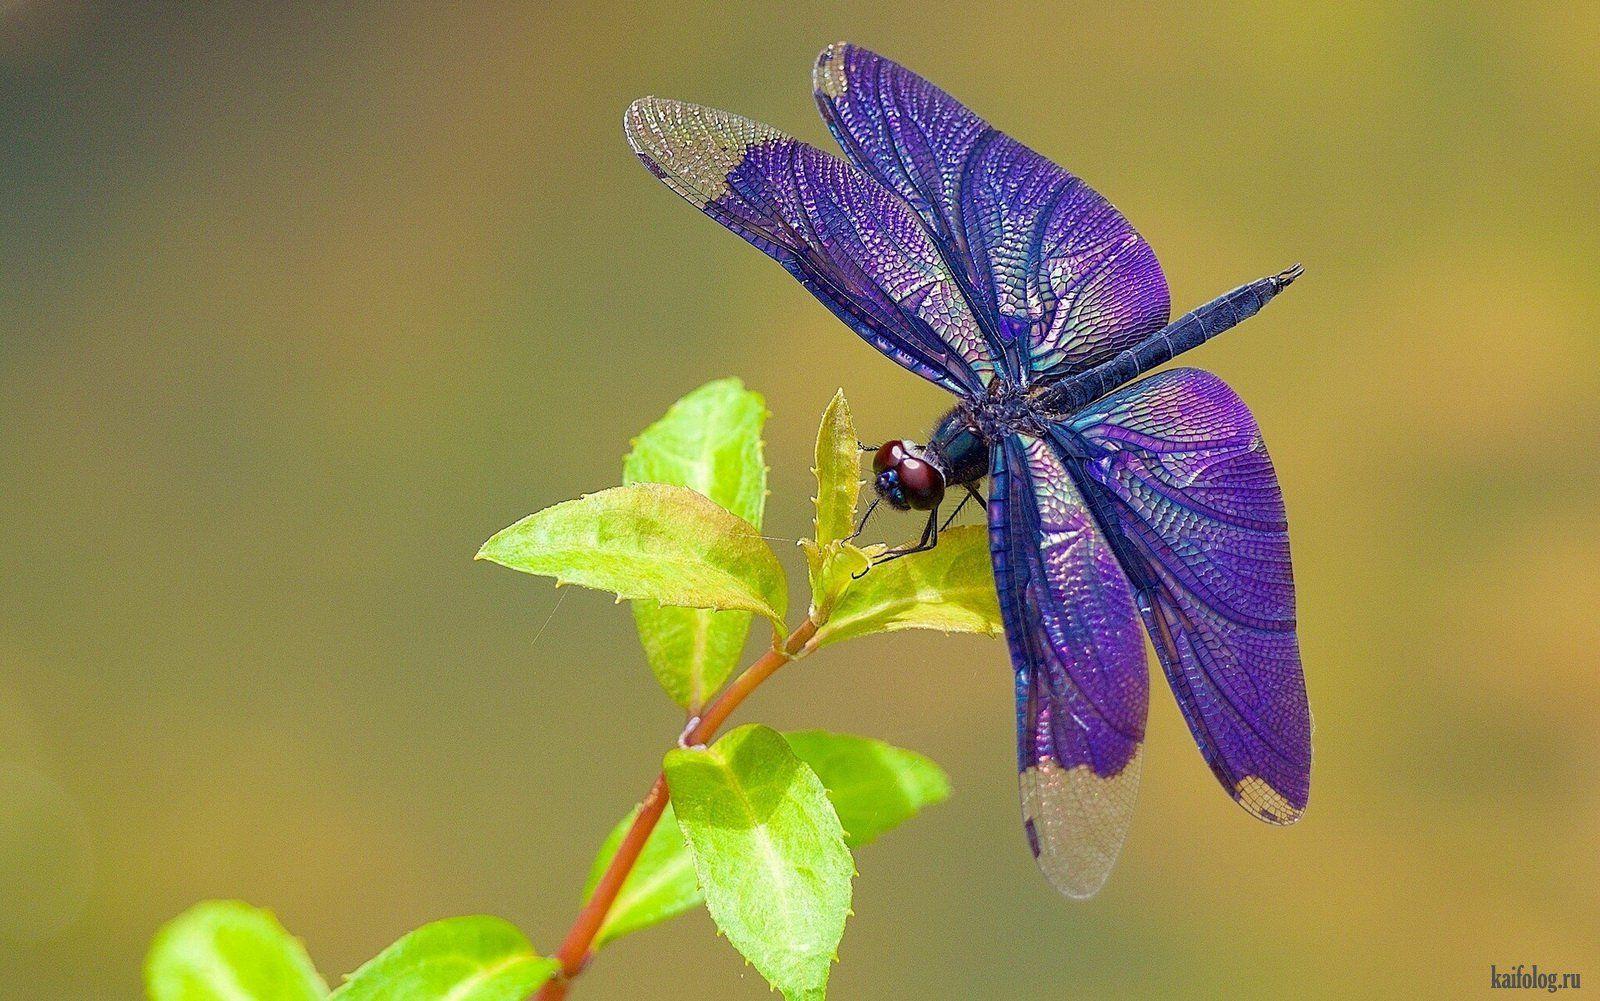 Красивые фотографии природы (55 фото) | Insect wings ...